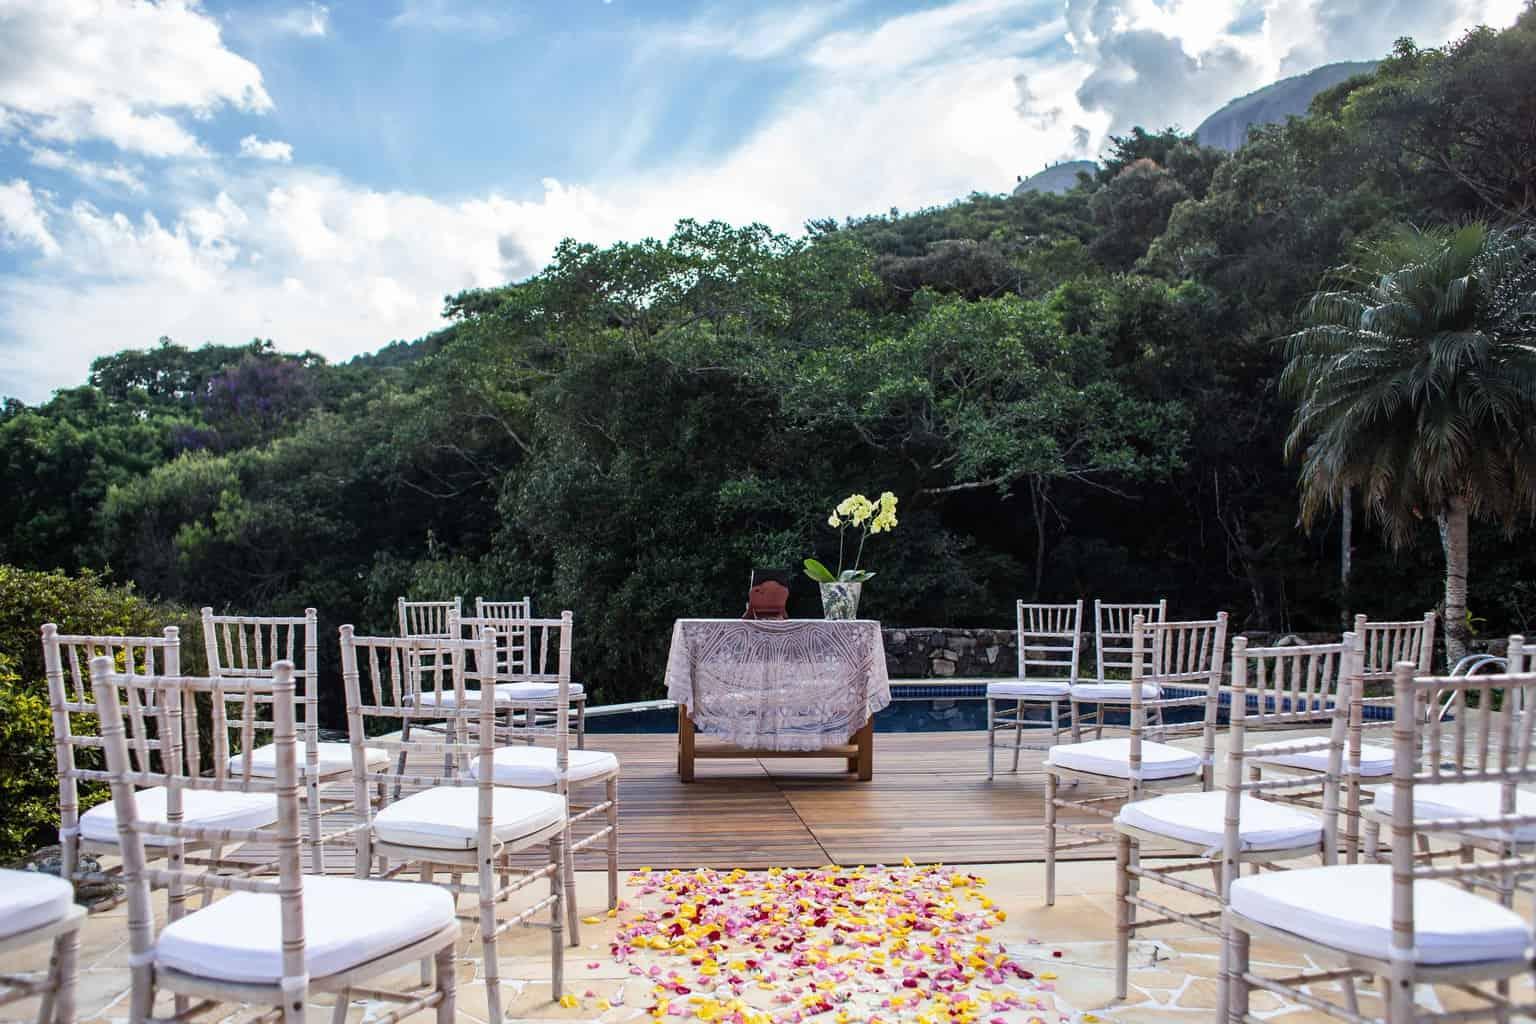 Casamento-Juliana-e-Sebastian-cerimonia-ao-ar-livre-decoracao-Pousada-La-Belle-Bruna14